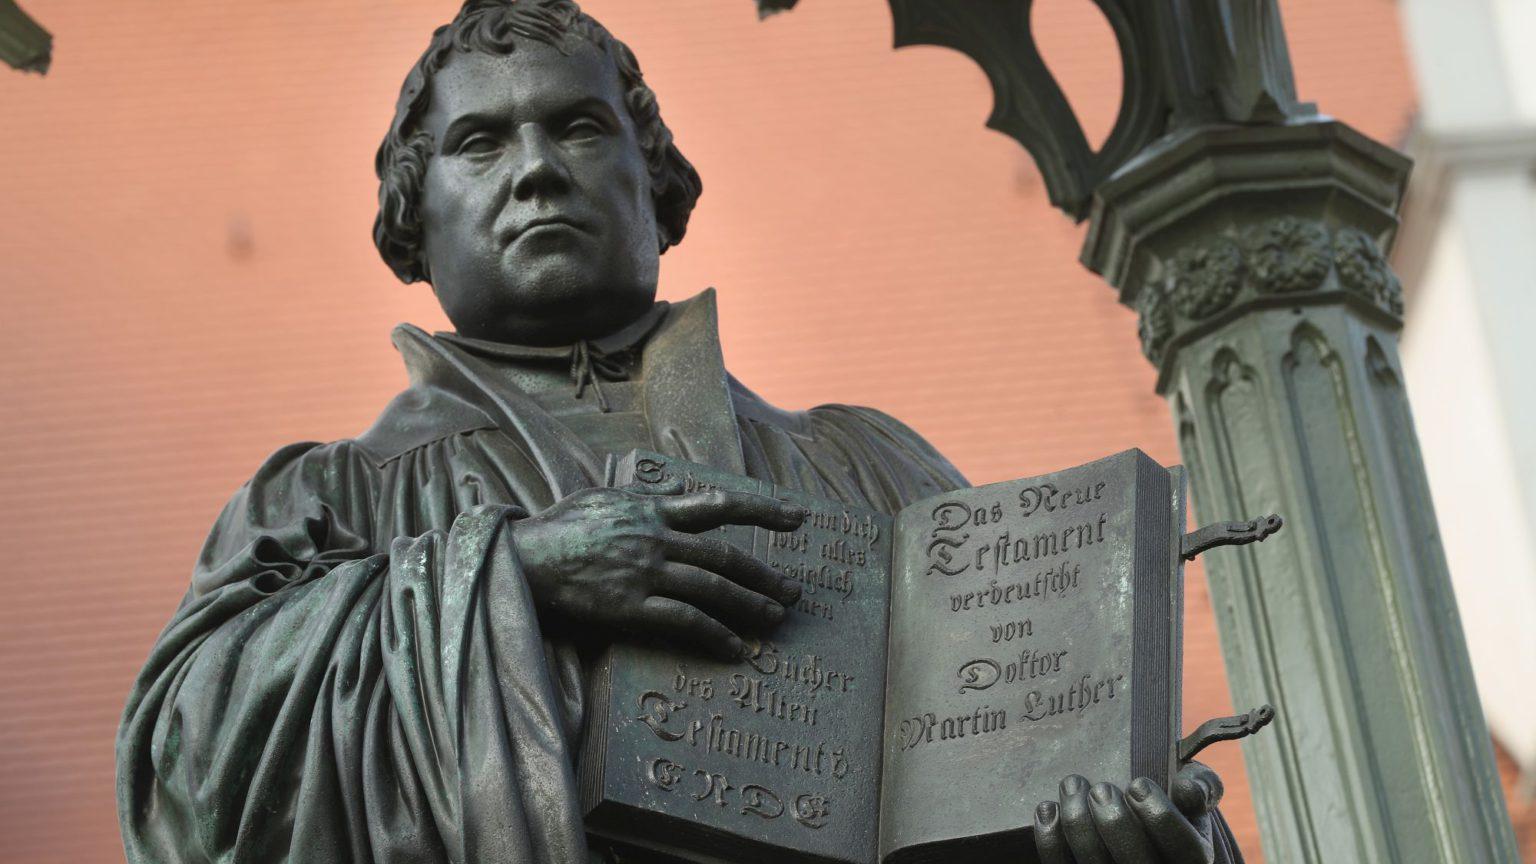 Why heretics need to be heard